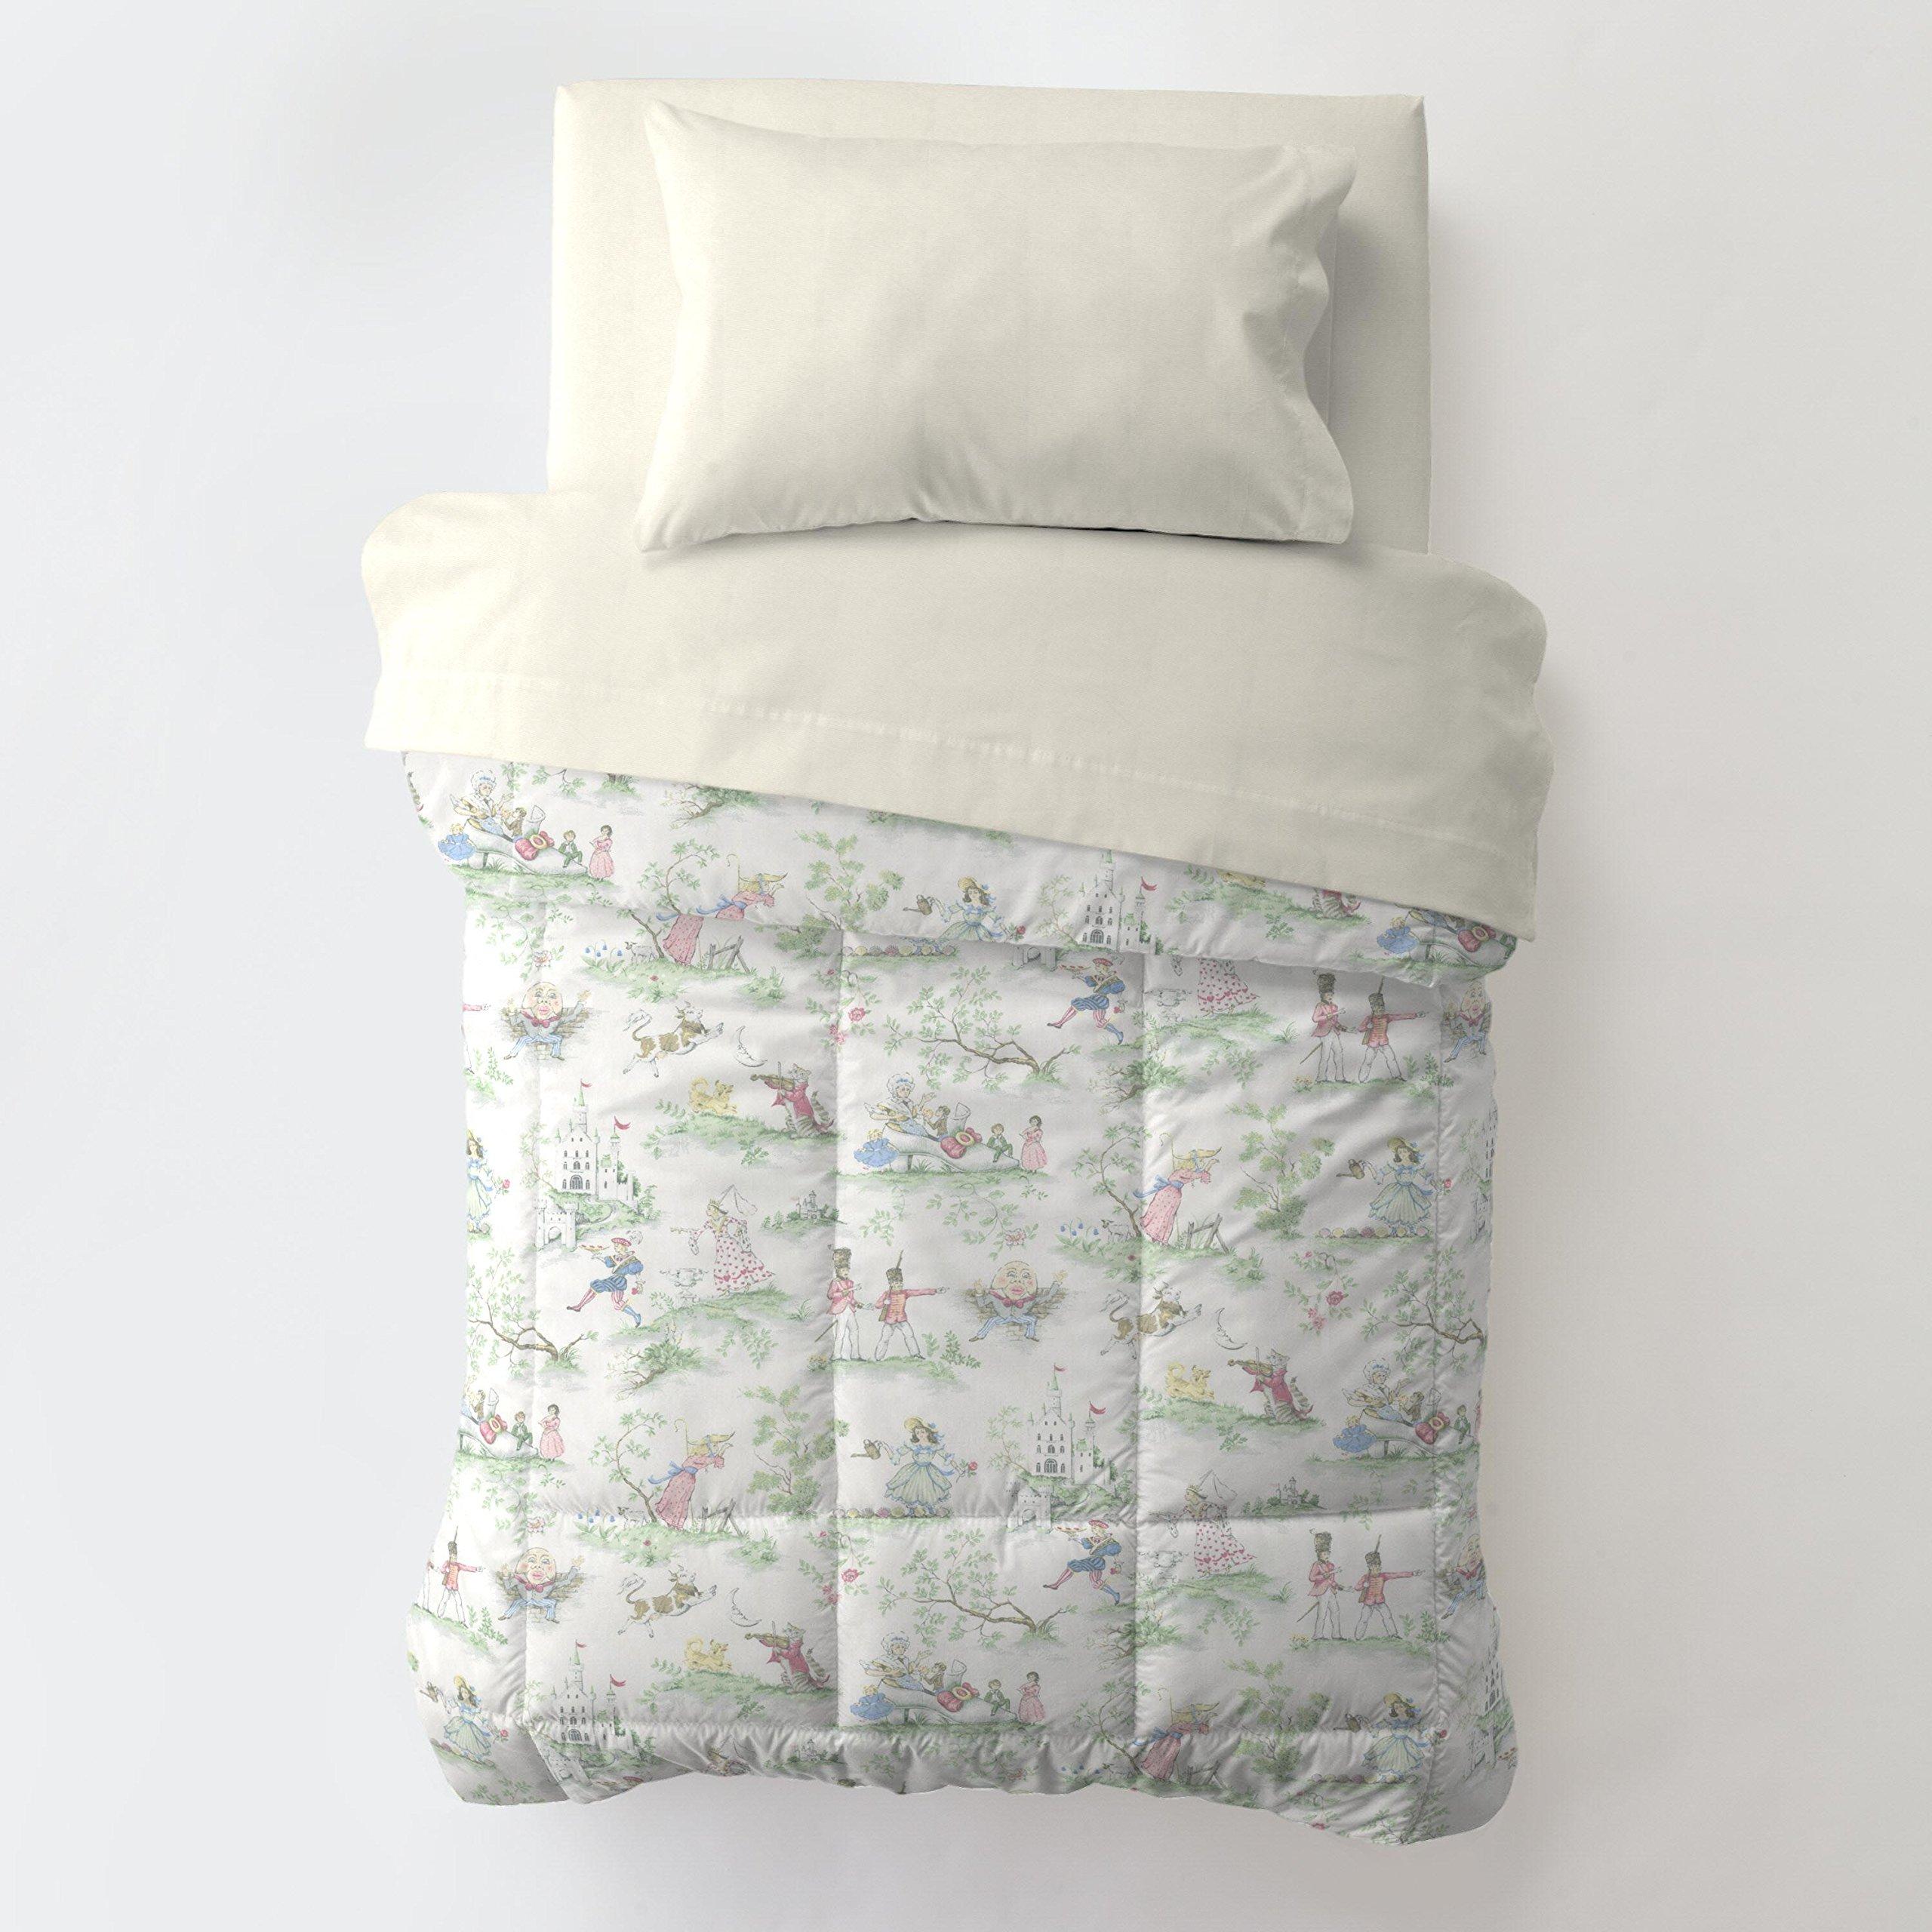 Carousel Designs Nursery Rhyme Toile Toddler Bed Comforter